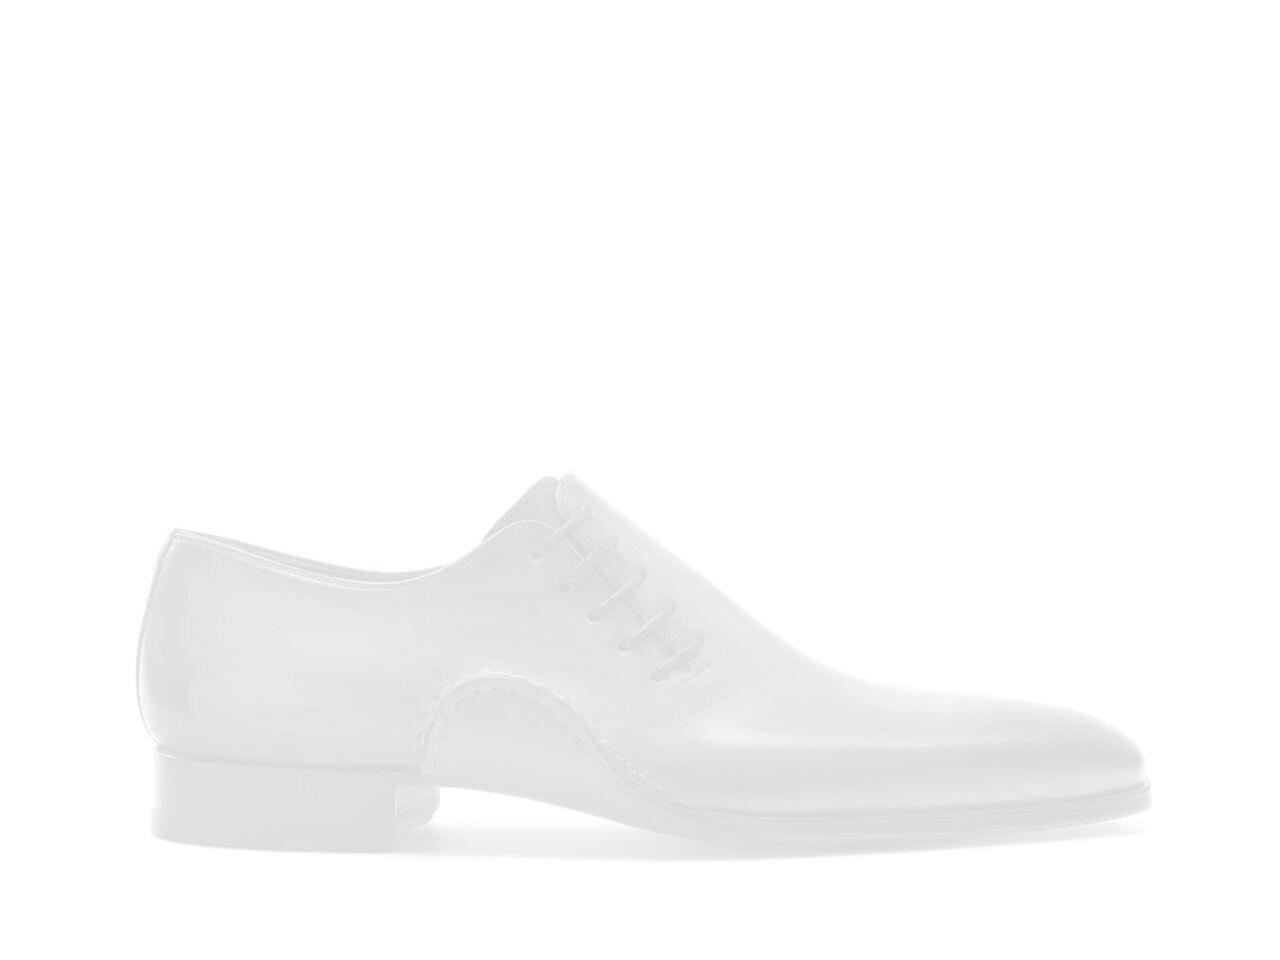 Pair of the Magnanni Magnanni X Pelotonia Men's Sneakers